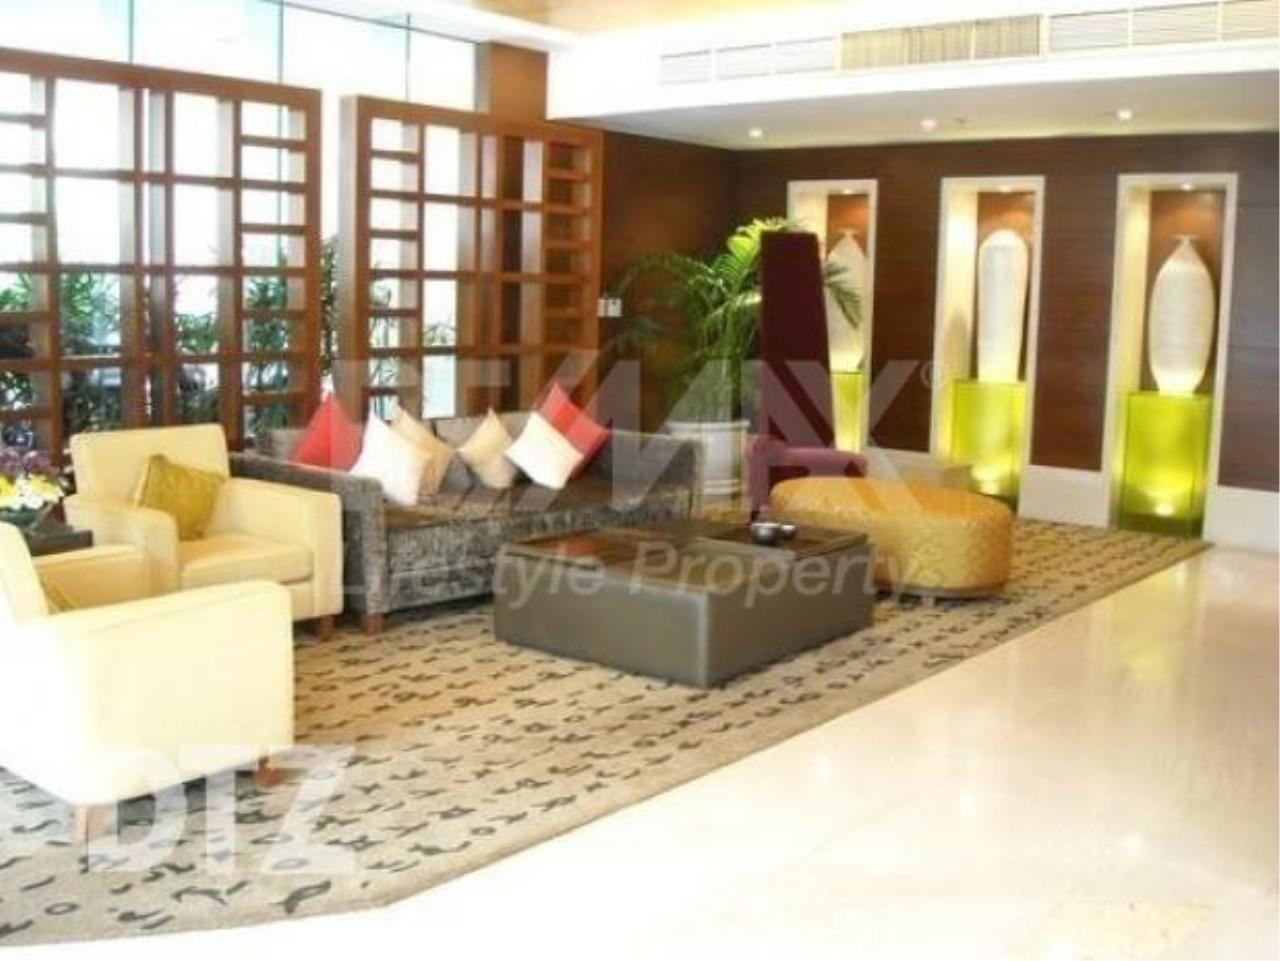 RE/MAX LifeStyle Property Agency's Baan Rajprasong 6